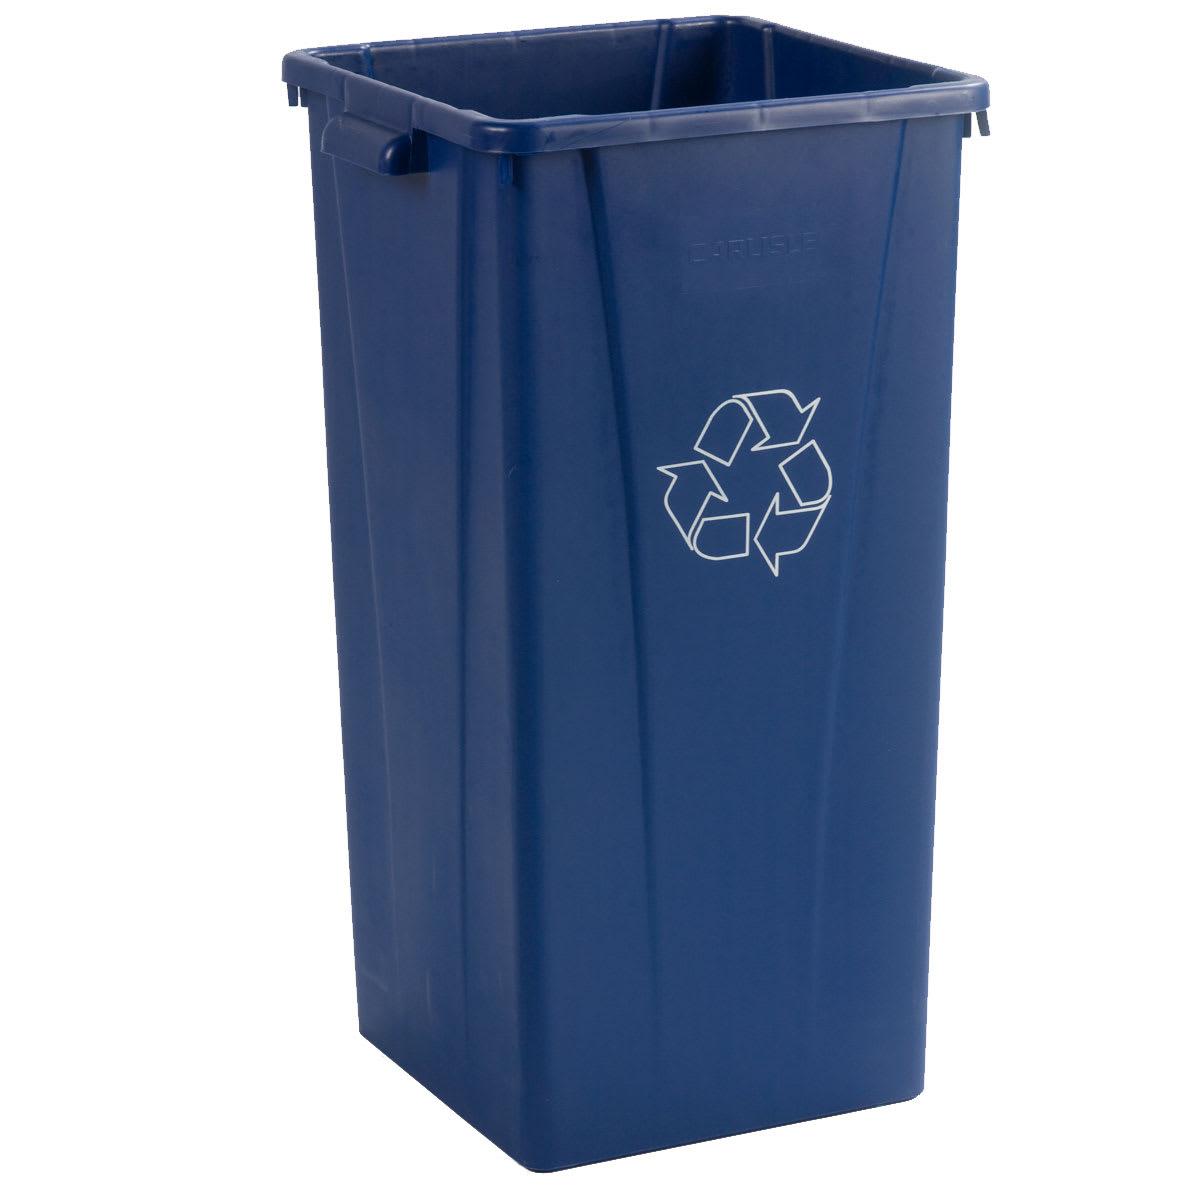 Carlisle CFS343523REC14 Centurian Tall Square Recycling Container, 23 Gallon, Polyethylene (LLDPE), Blue, 4 Per Case